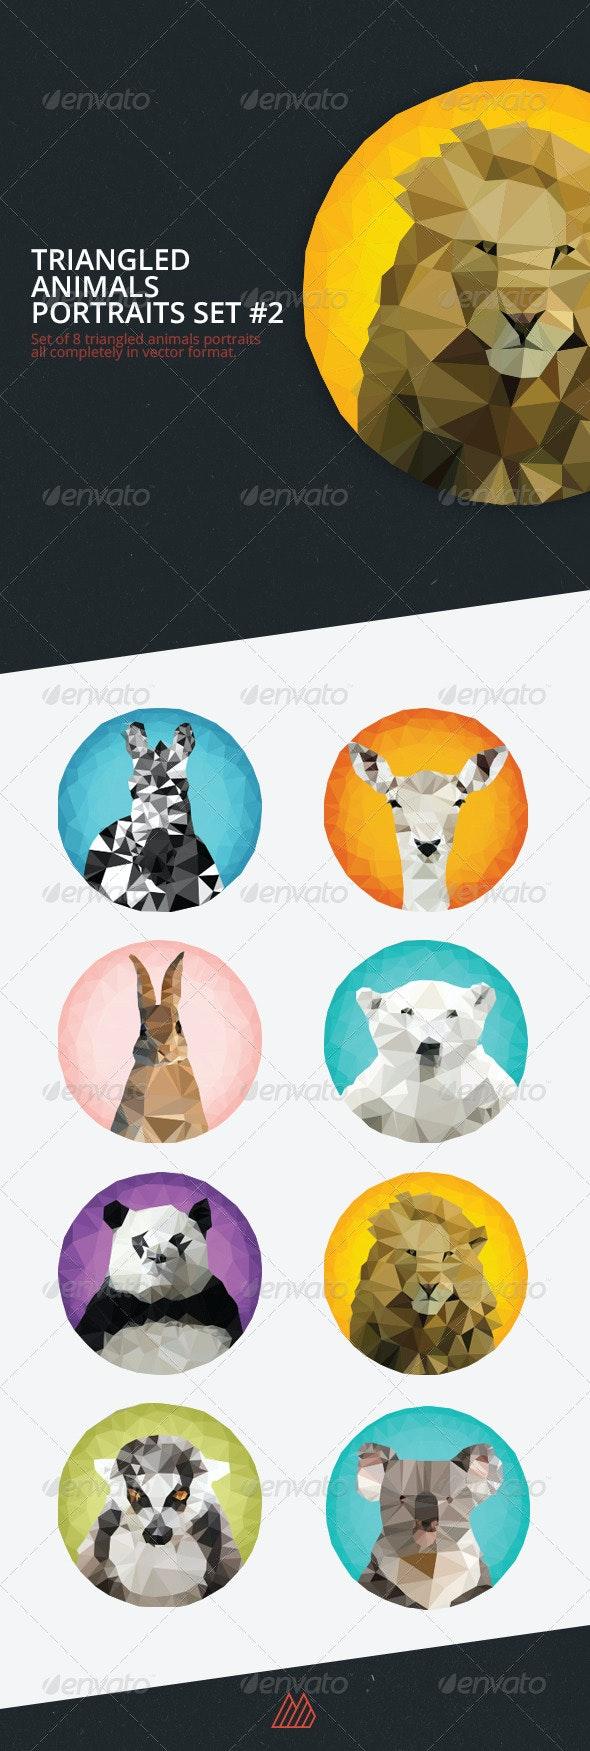 Triangled Animals Portraits Set #2 - Animals Characters